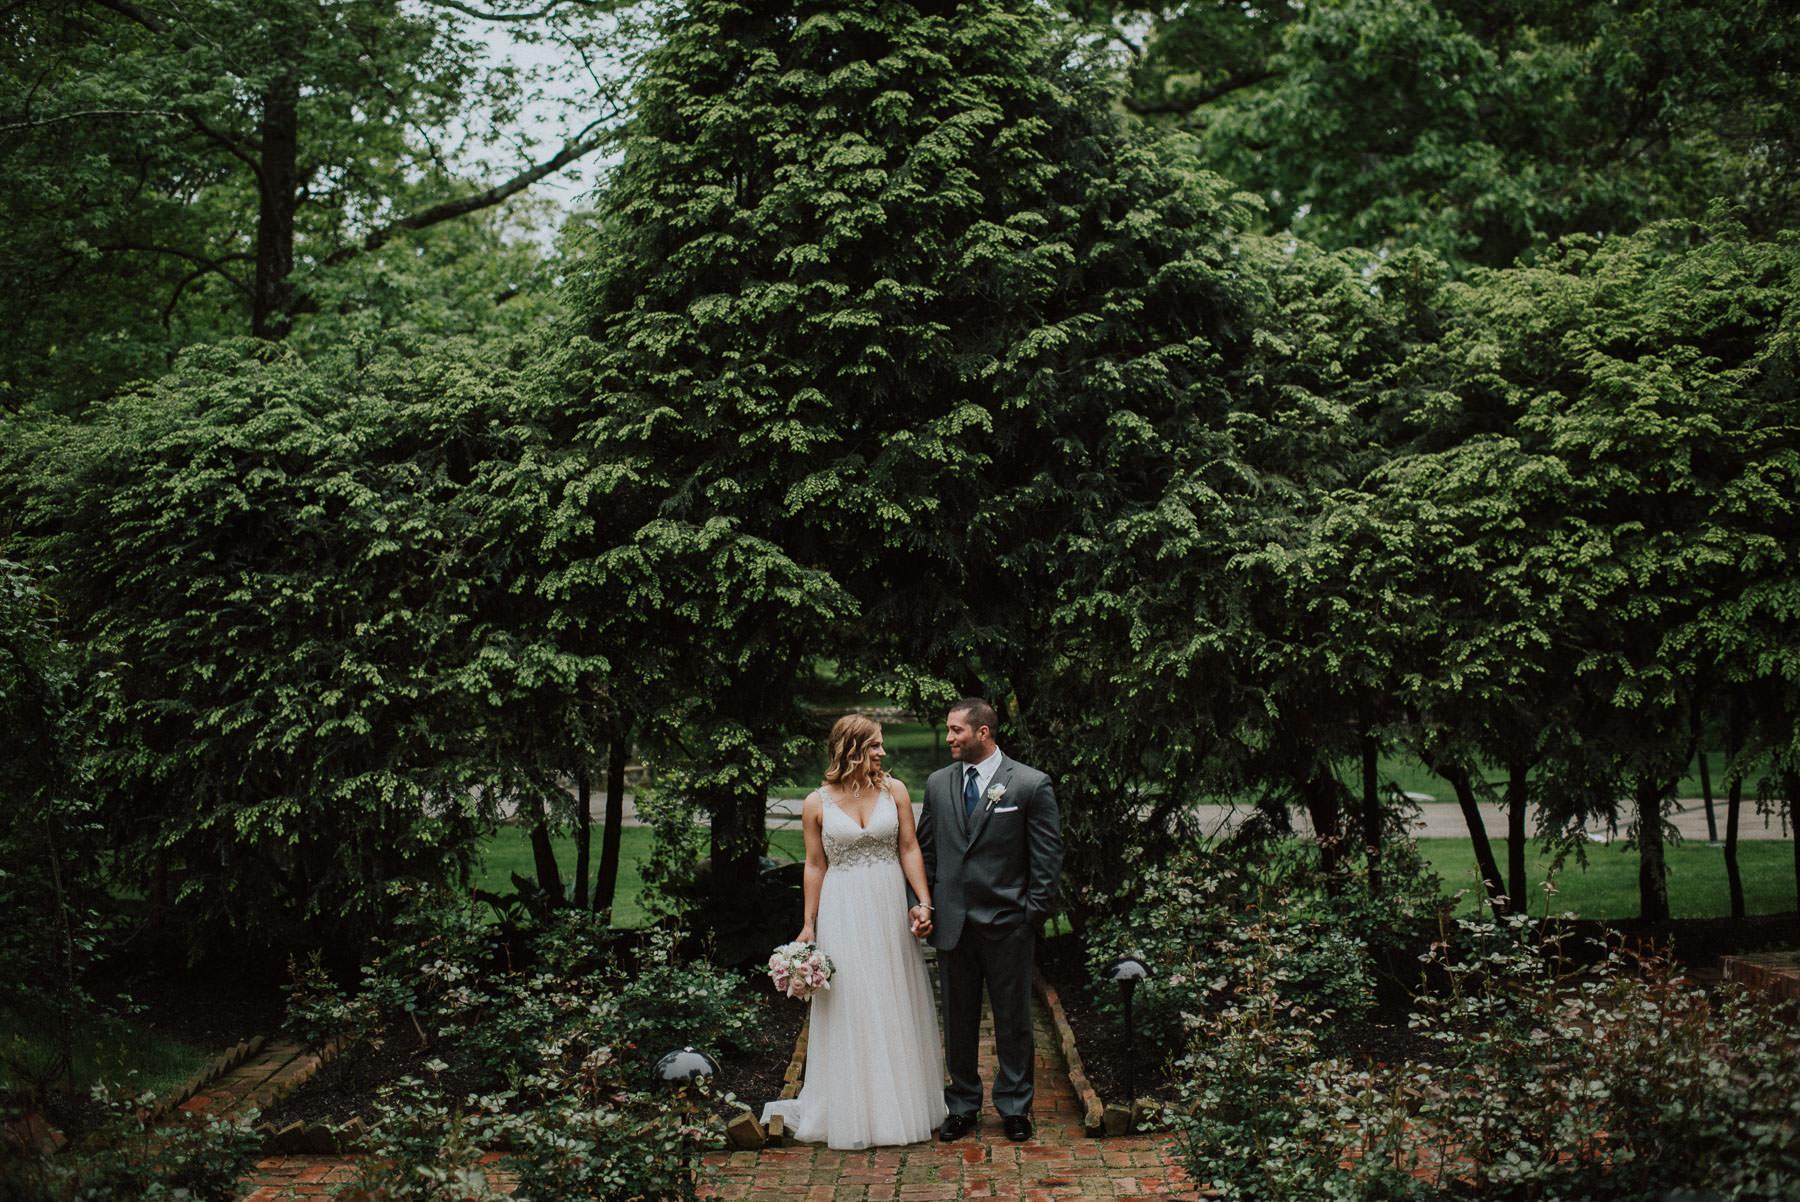 appleford-estate-wedding-photography-33.jpg